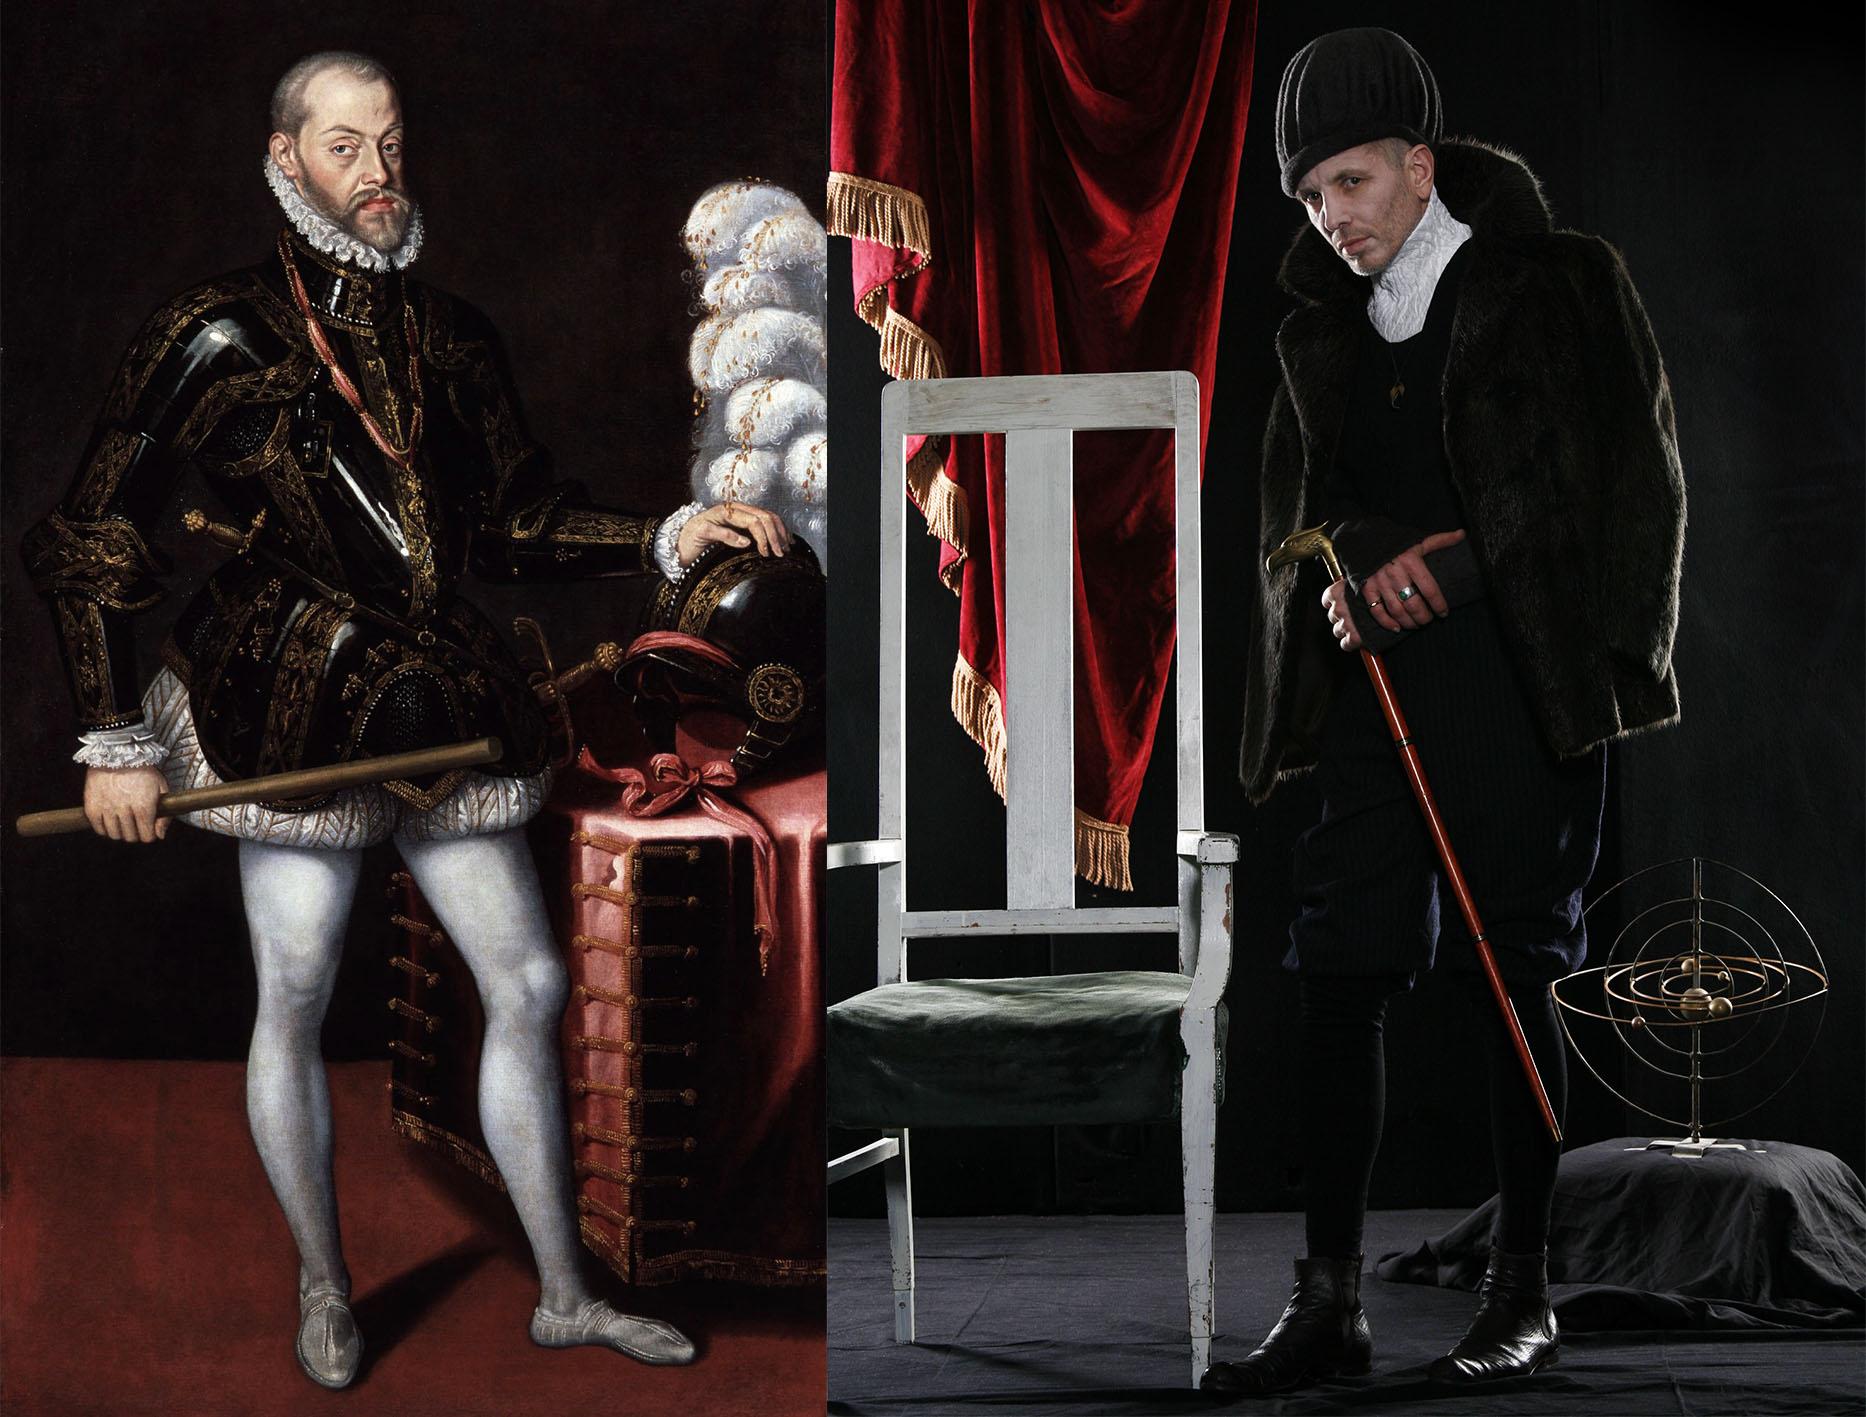 Philip II King of Spain a